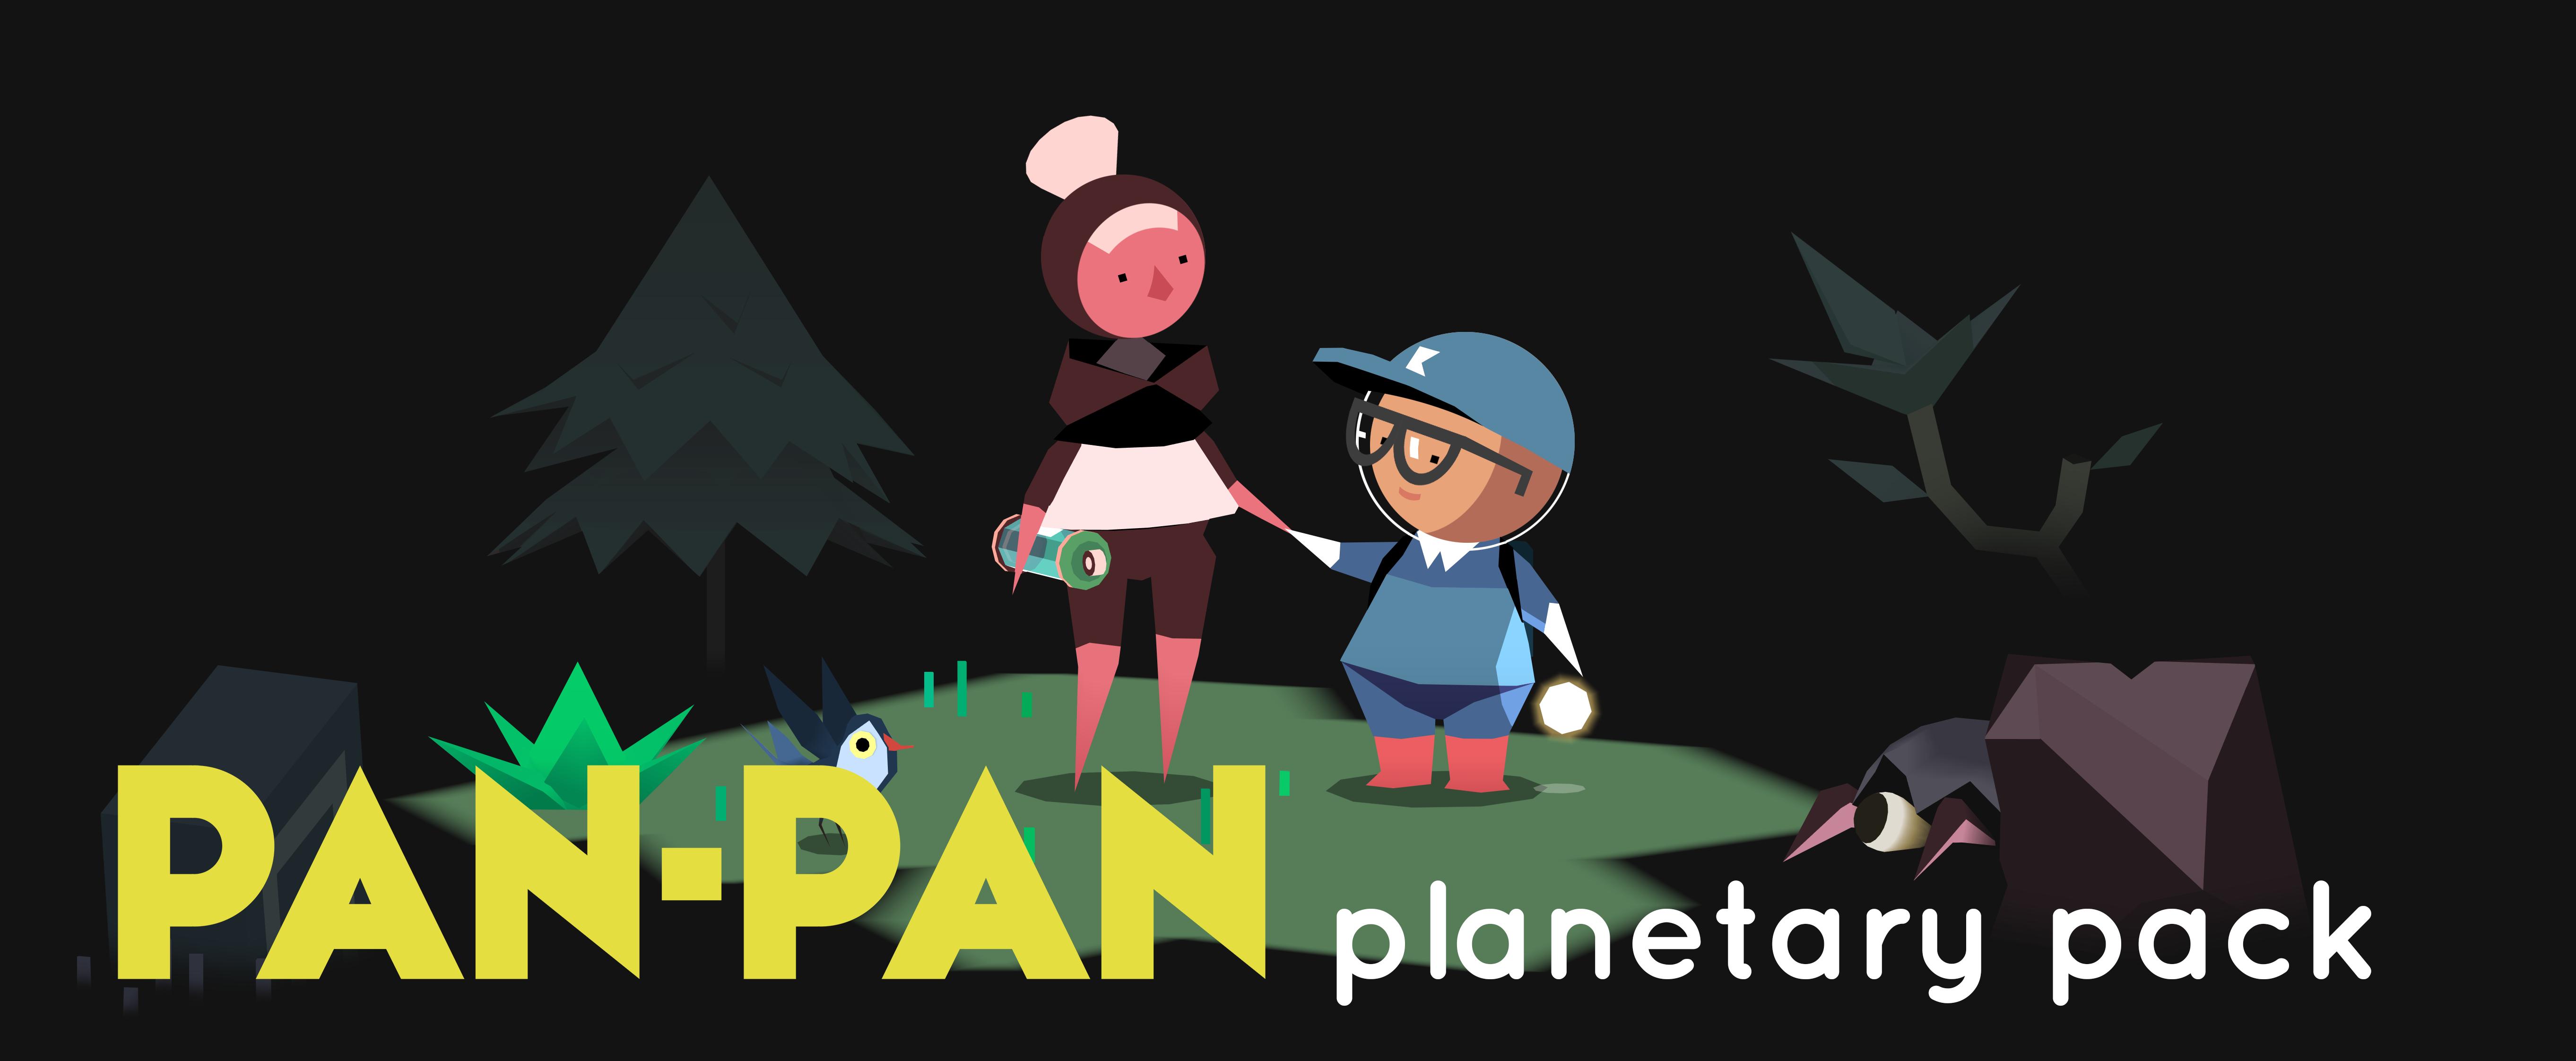 Pan-Pan: Planetary Pack